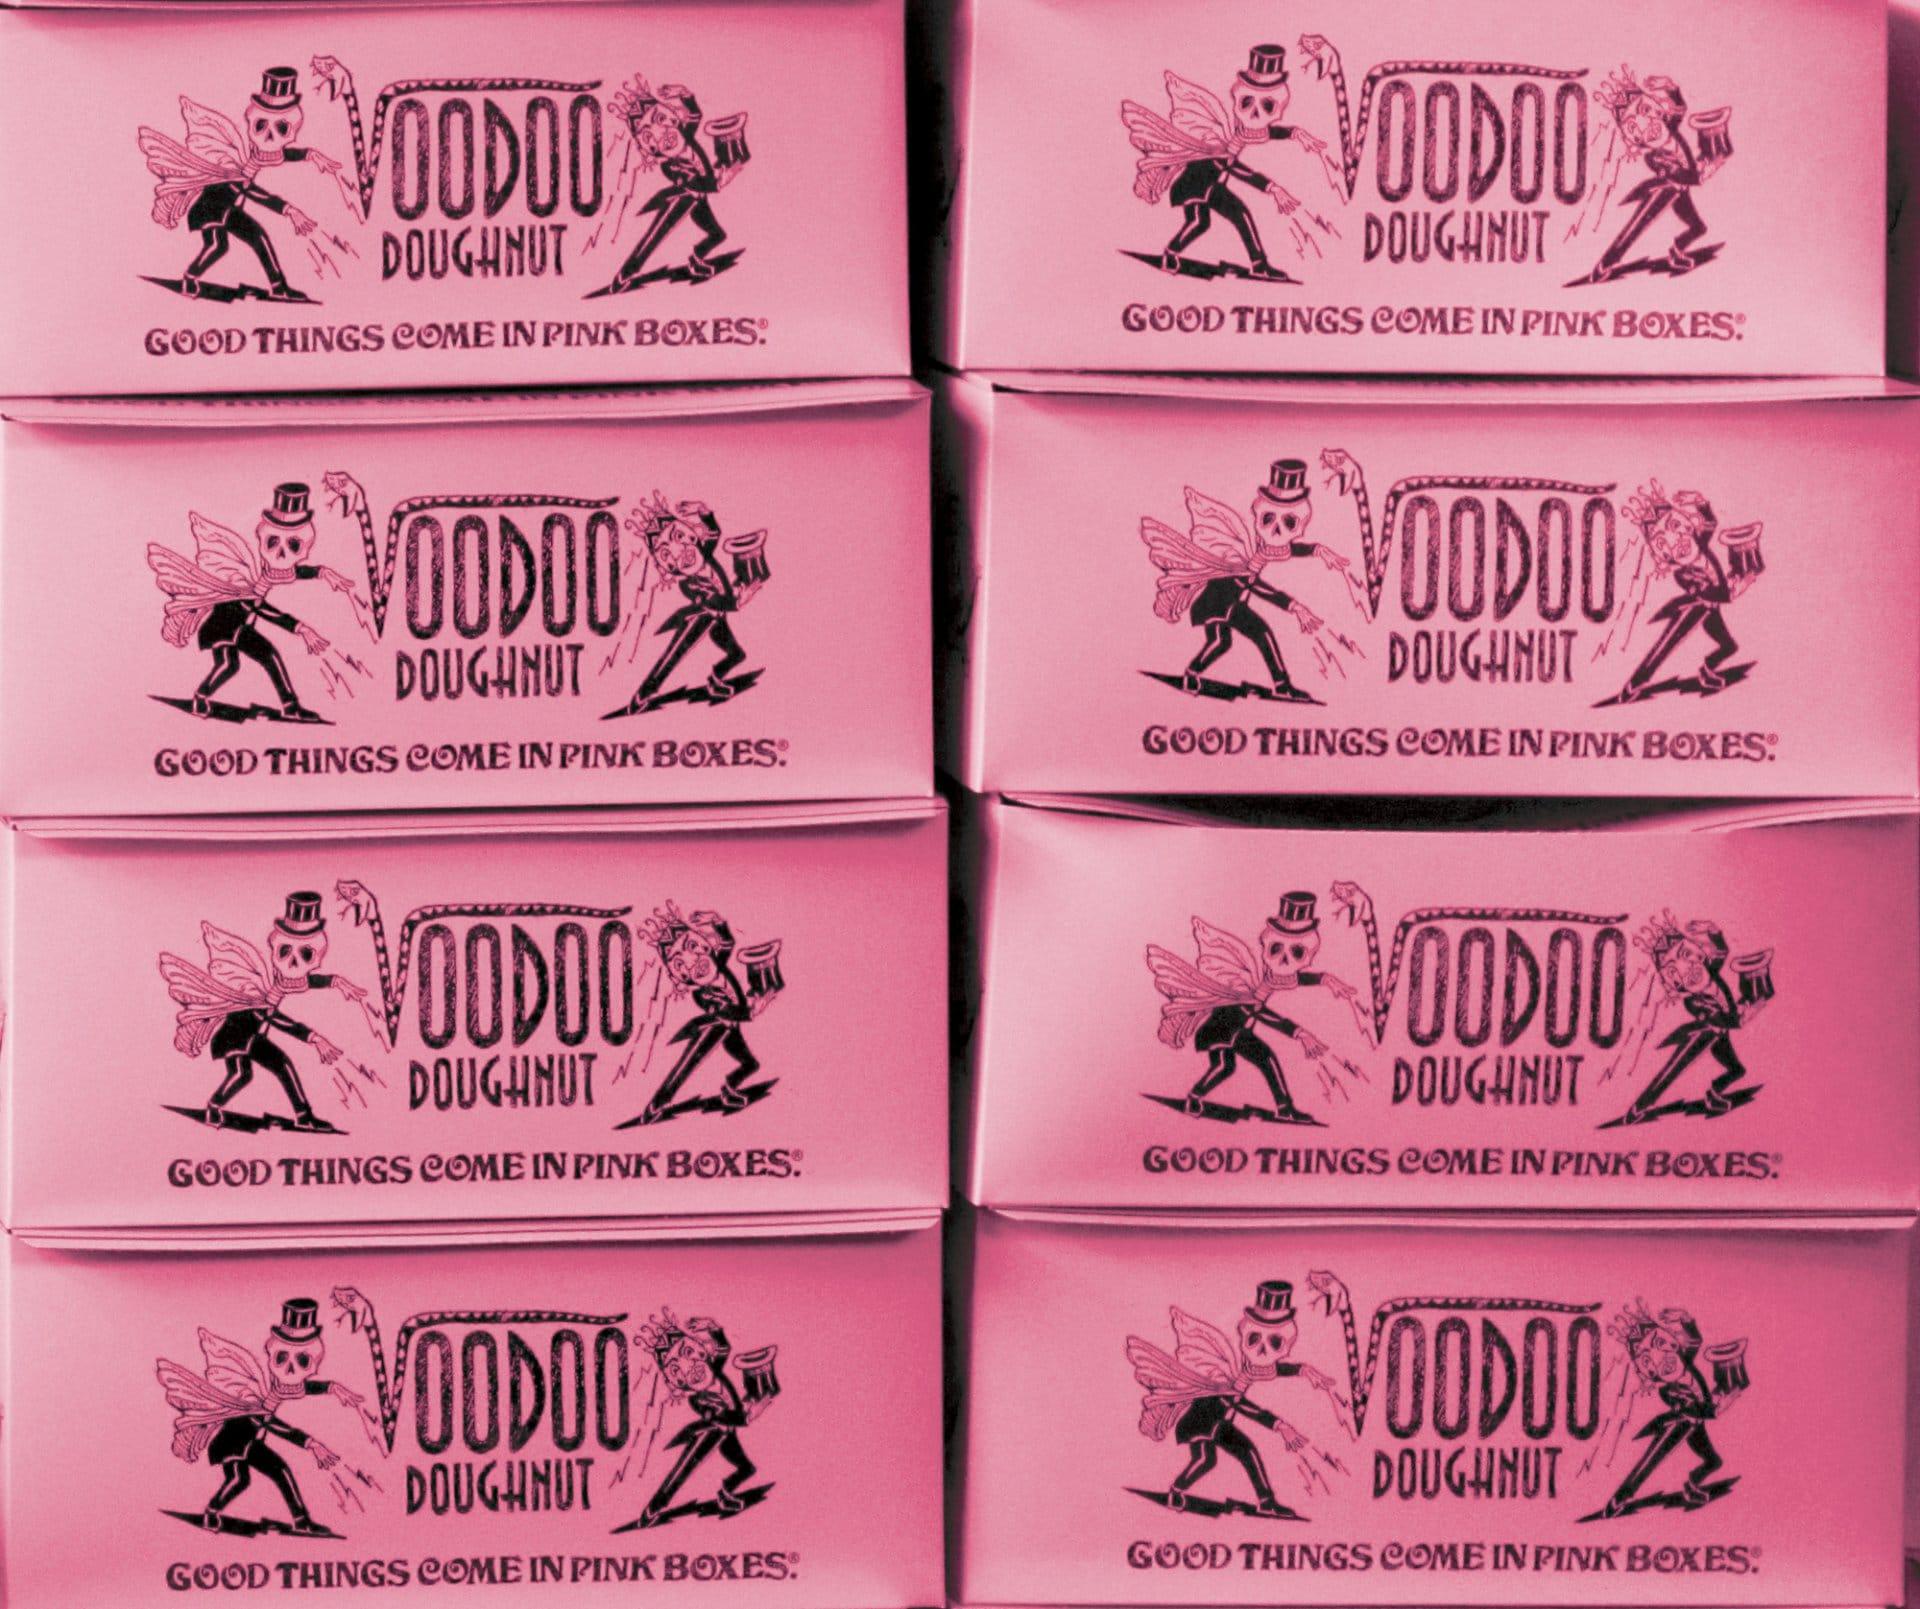 Voodoo-Doughnut Boxes